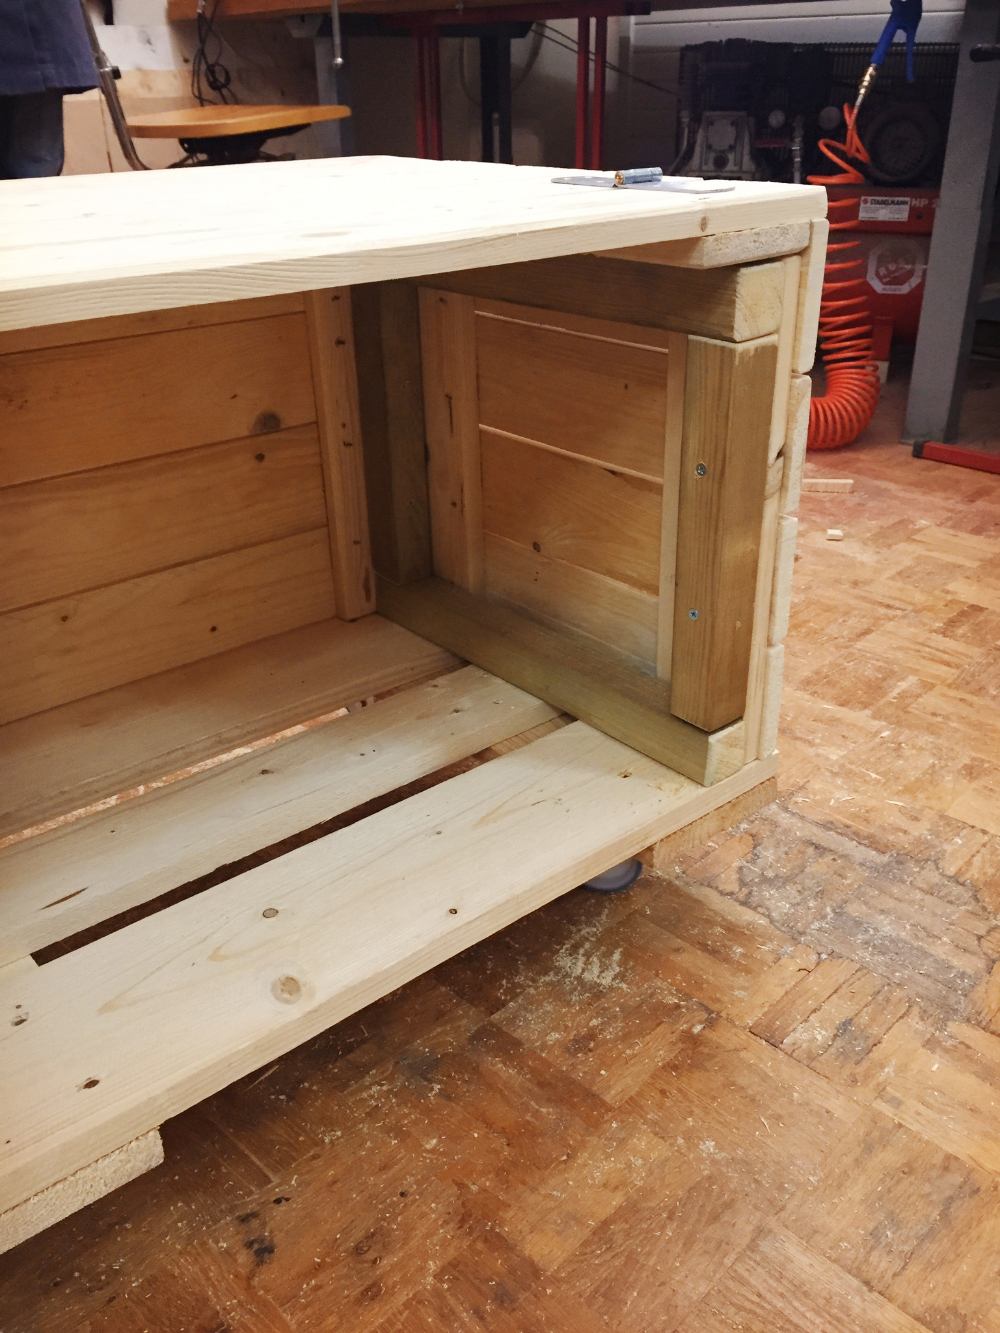 Costruire Una Cassapanca Pdf.Upcycling I Pallet Diventano Una Cassapanca